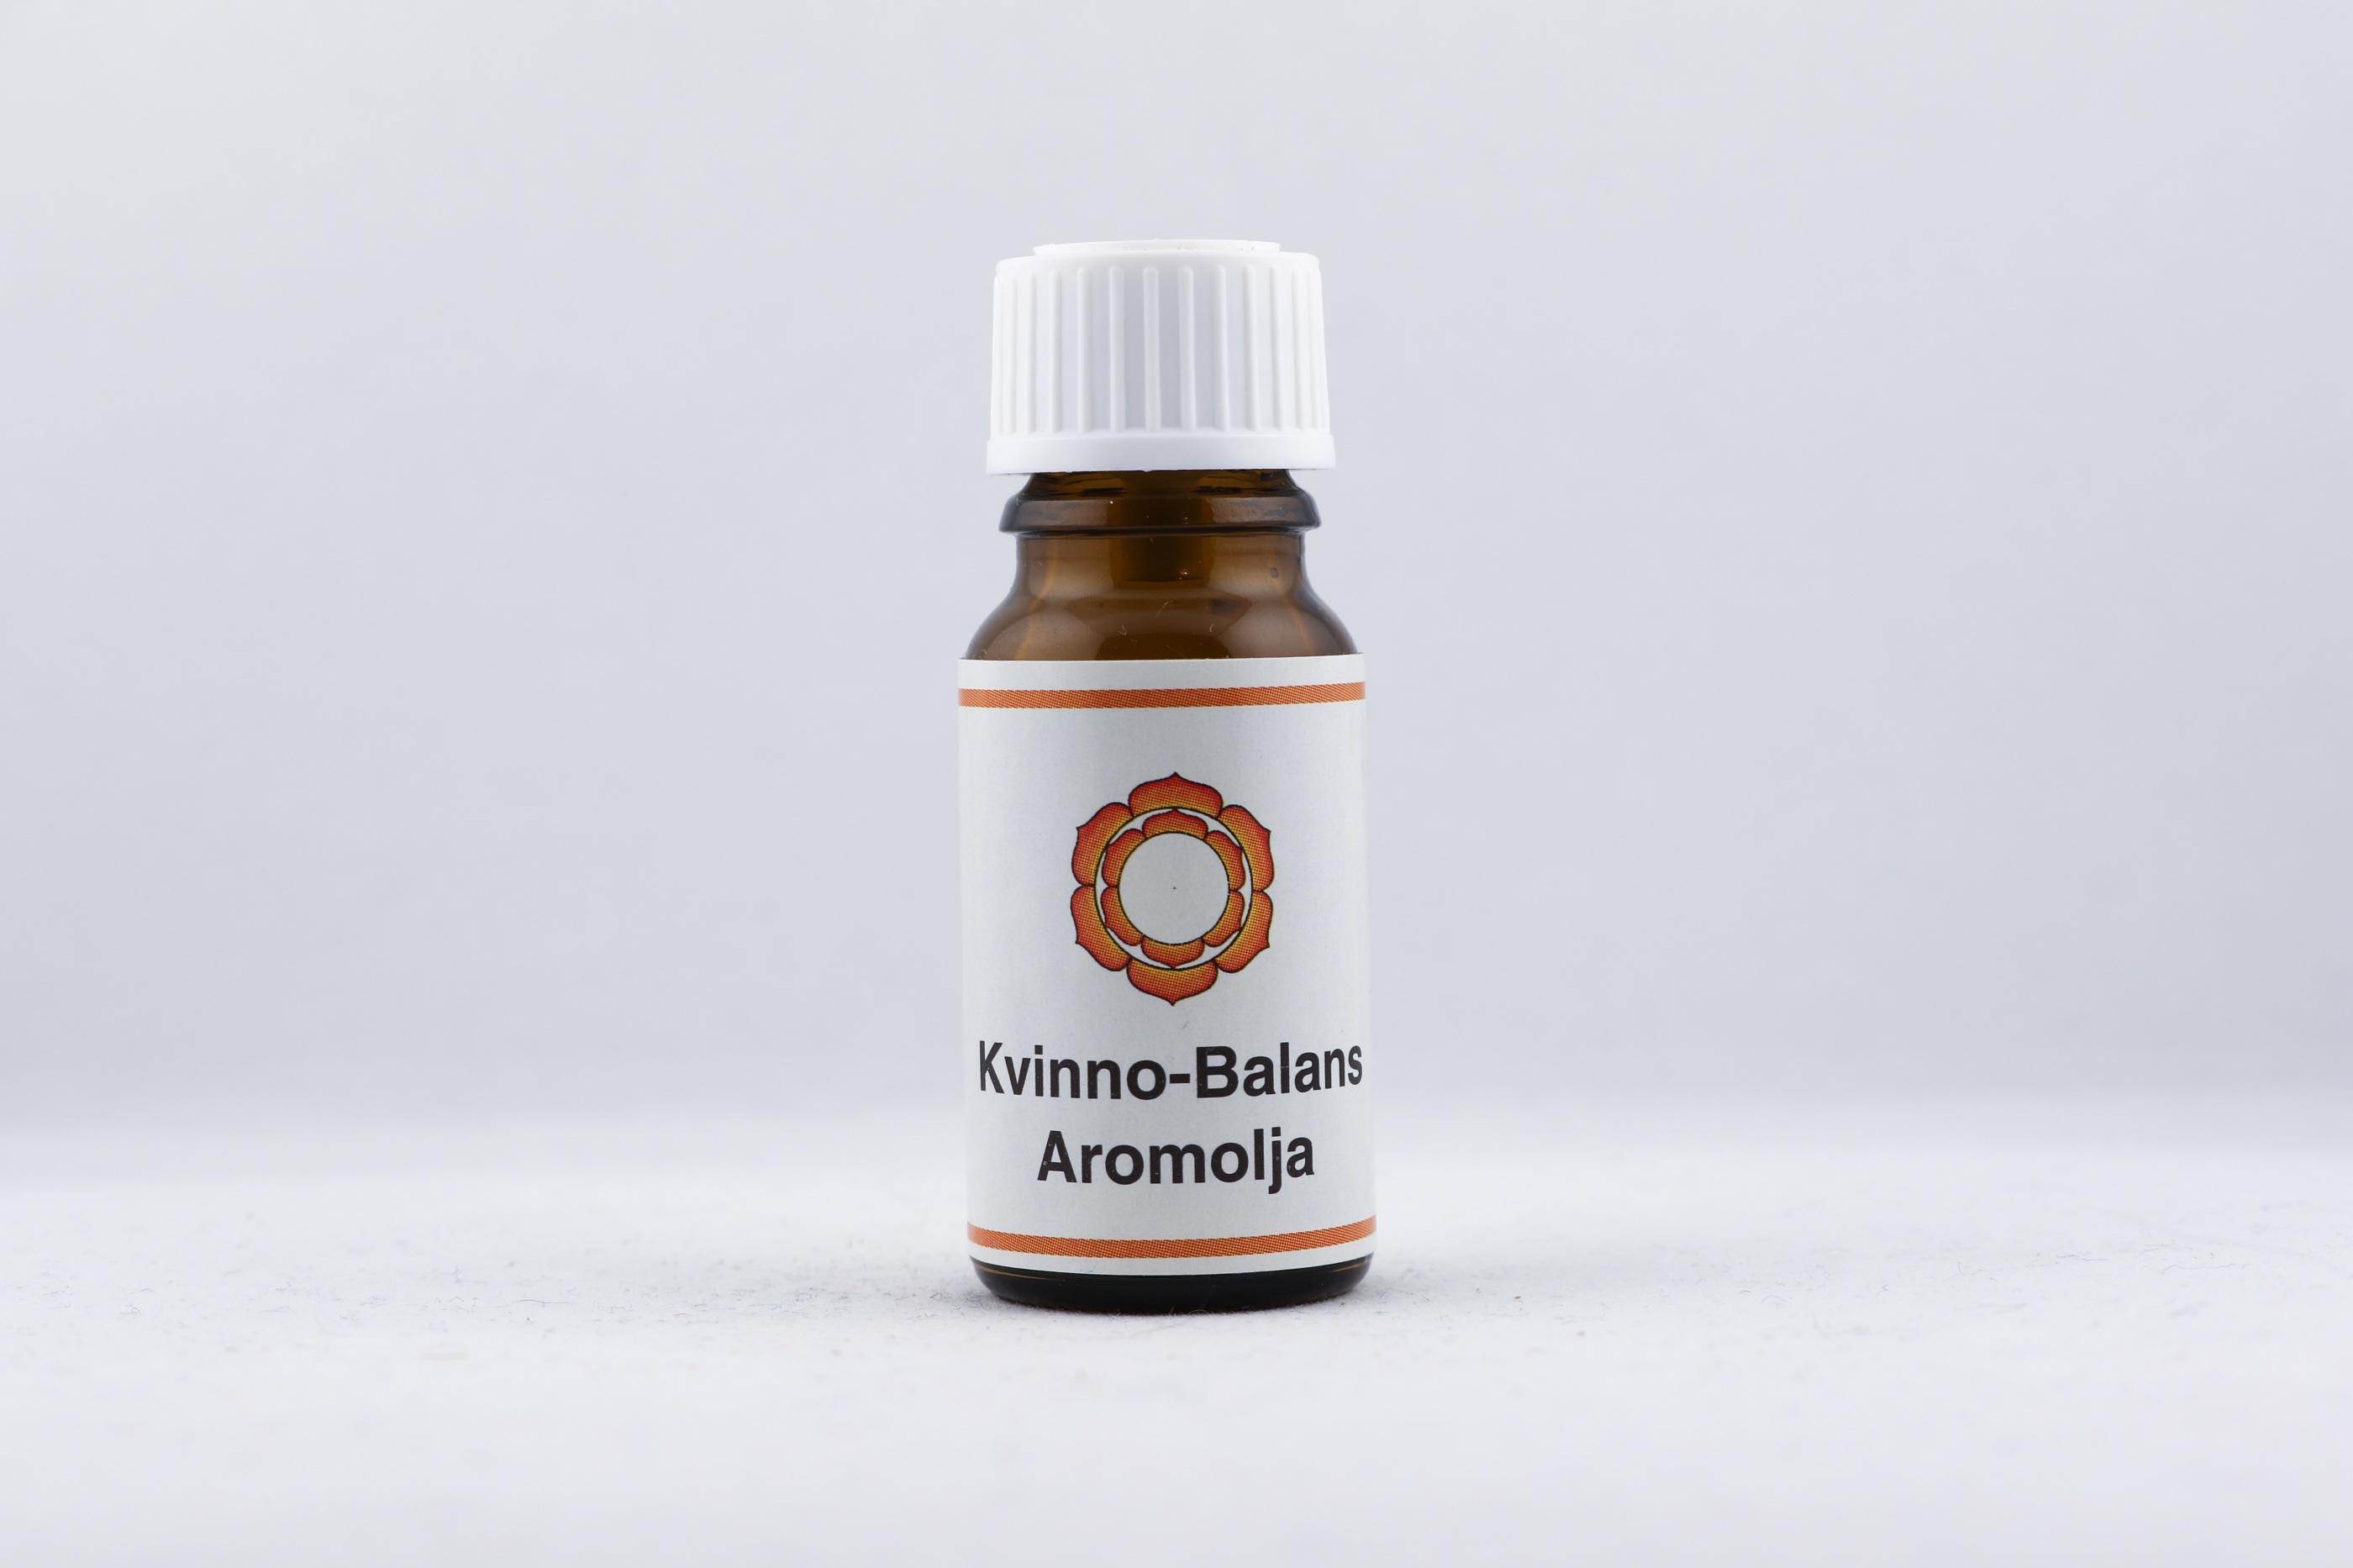 Kvinno-balans olja wellness ayurveda halmstad sweden svensk marmaolja